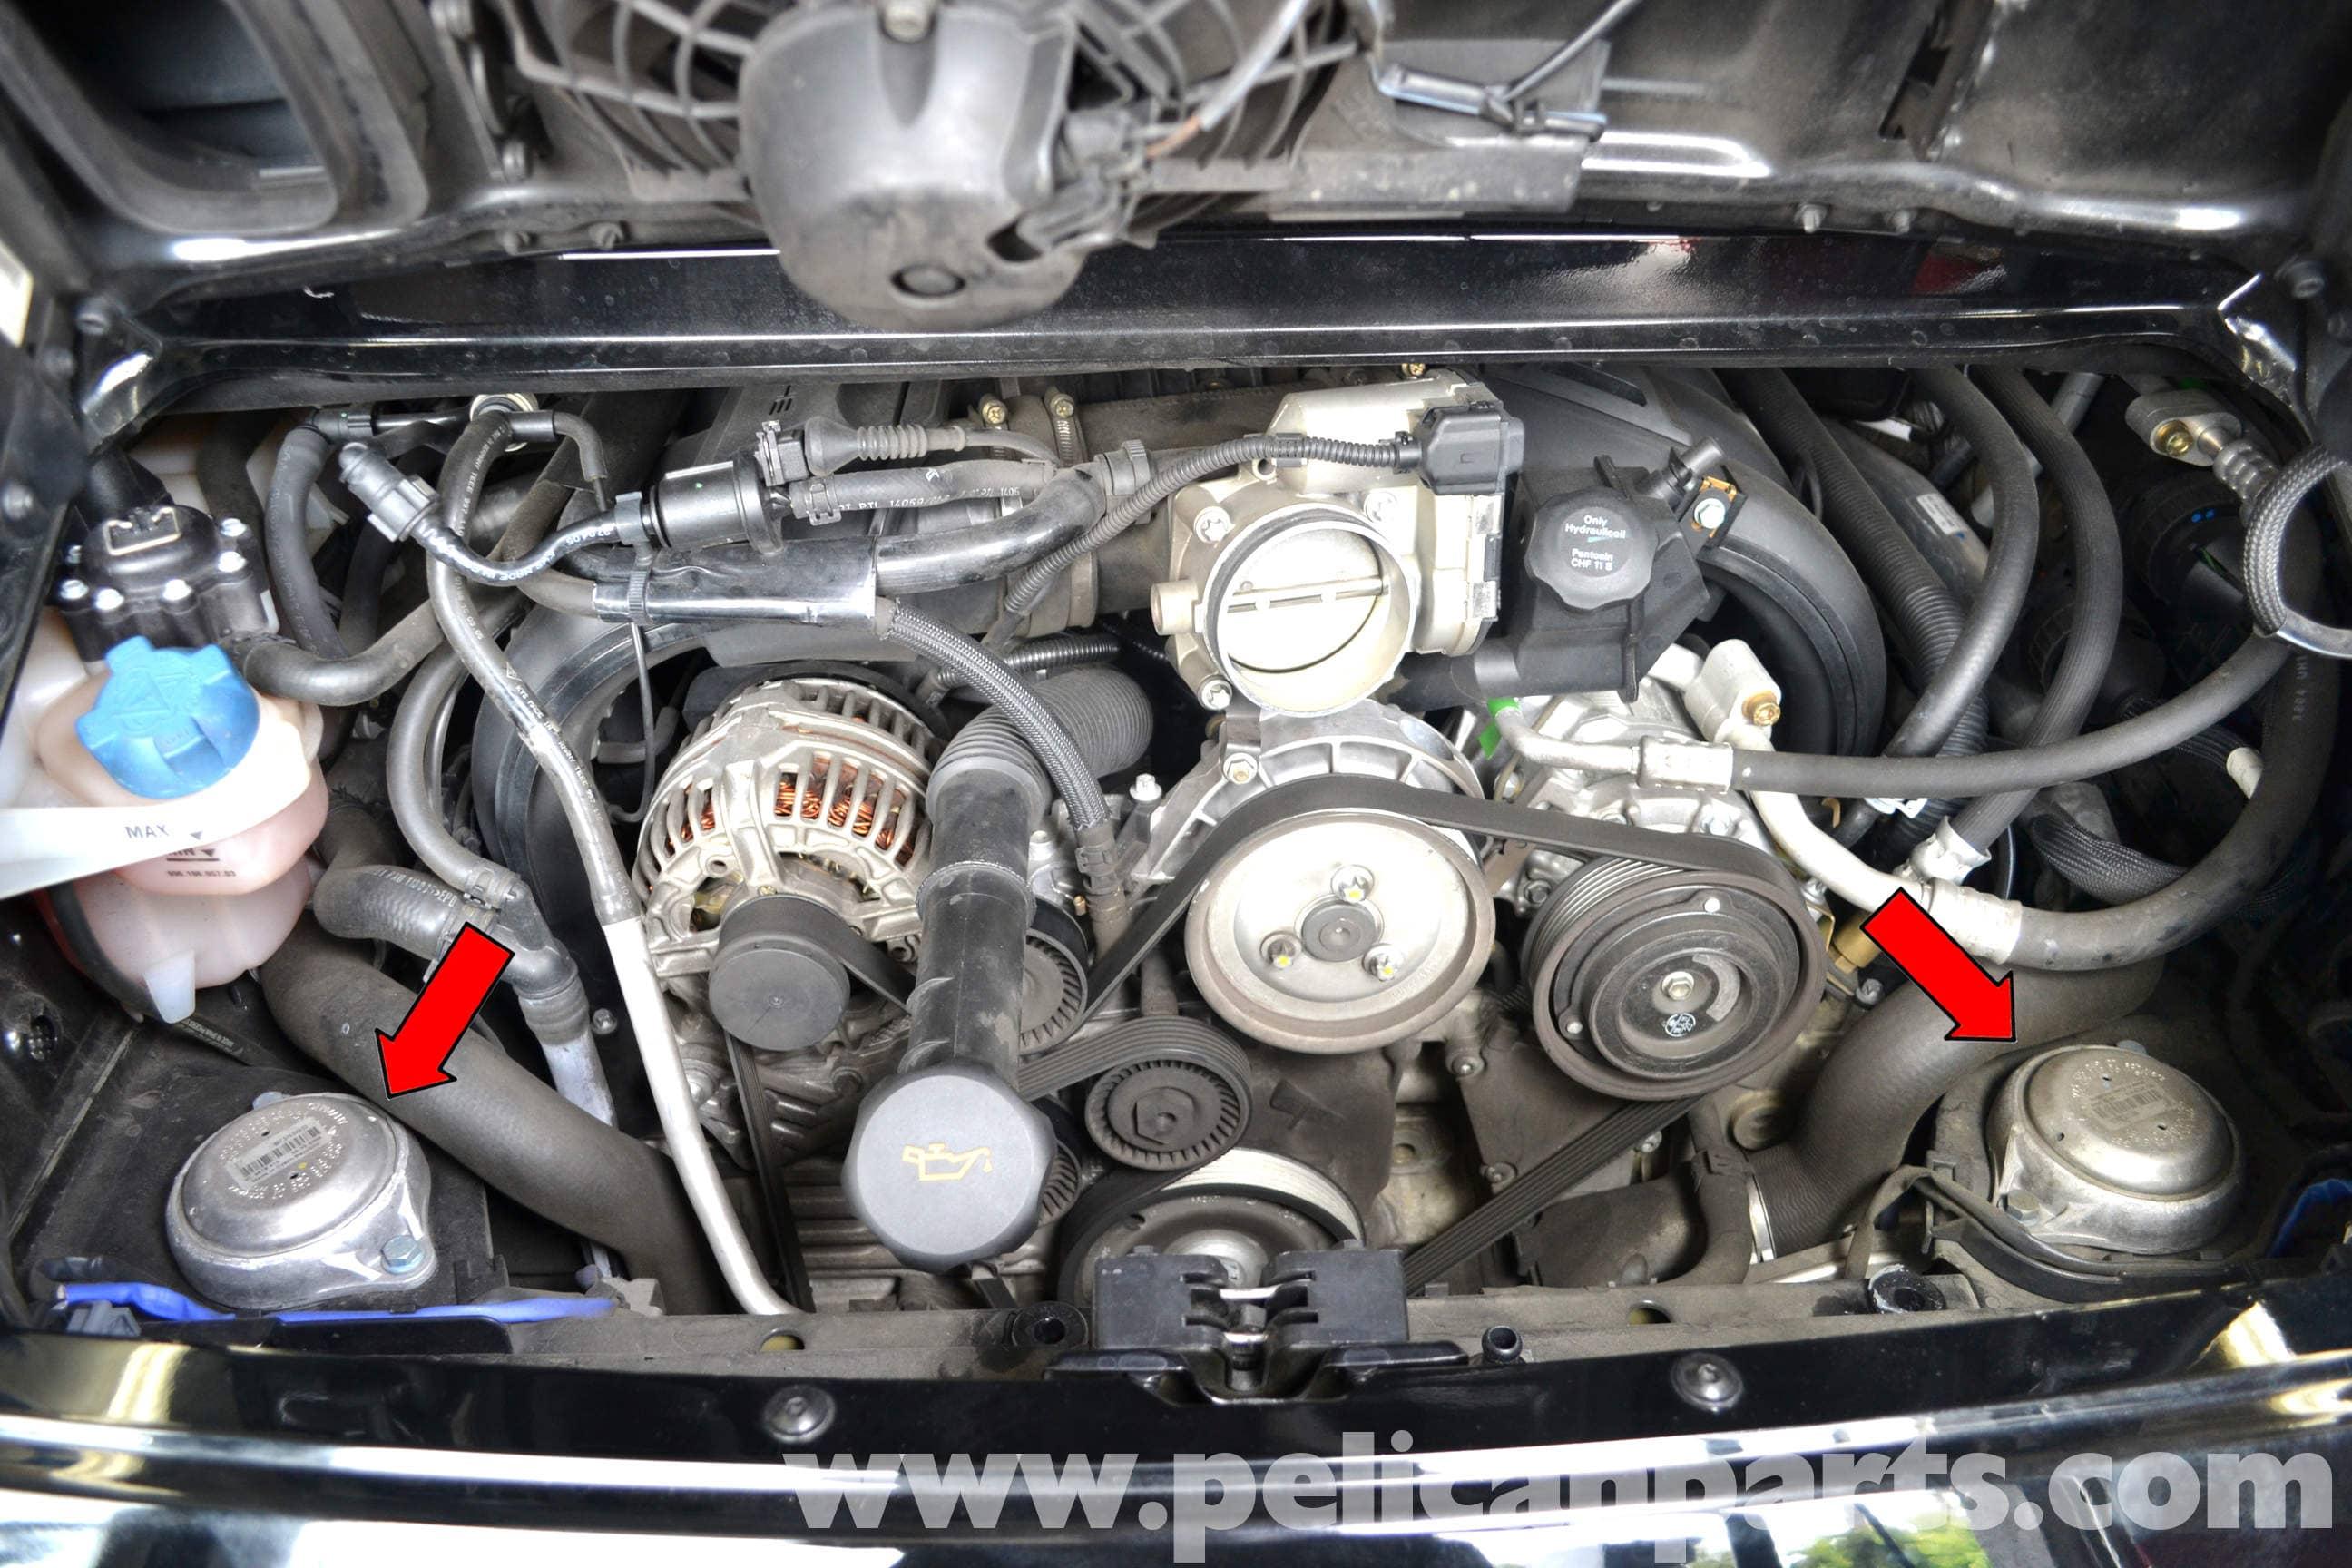 Toyota Land Cruiser Engine Diagram Oil Cooler together with P 0900c152800b8a8b besides Diagram besides 95 Camaro Lt1 Z28 Wiring Diagram further 1410442 What Symptoms Bad Maf. on 94 z28 engine diagram